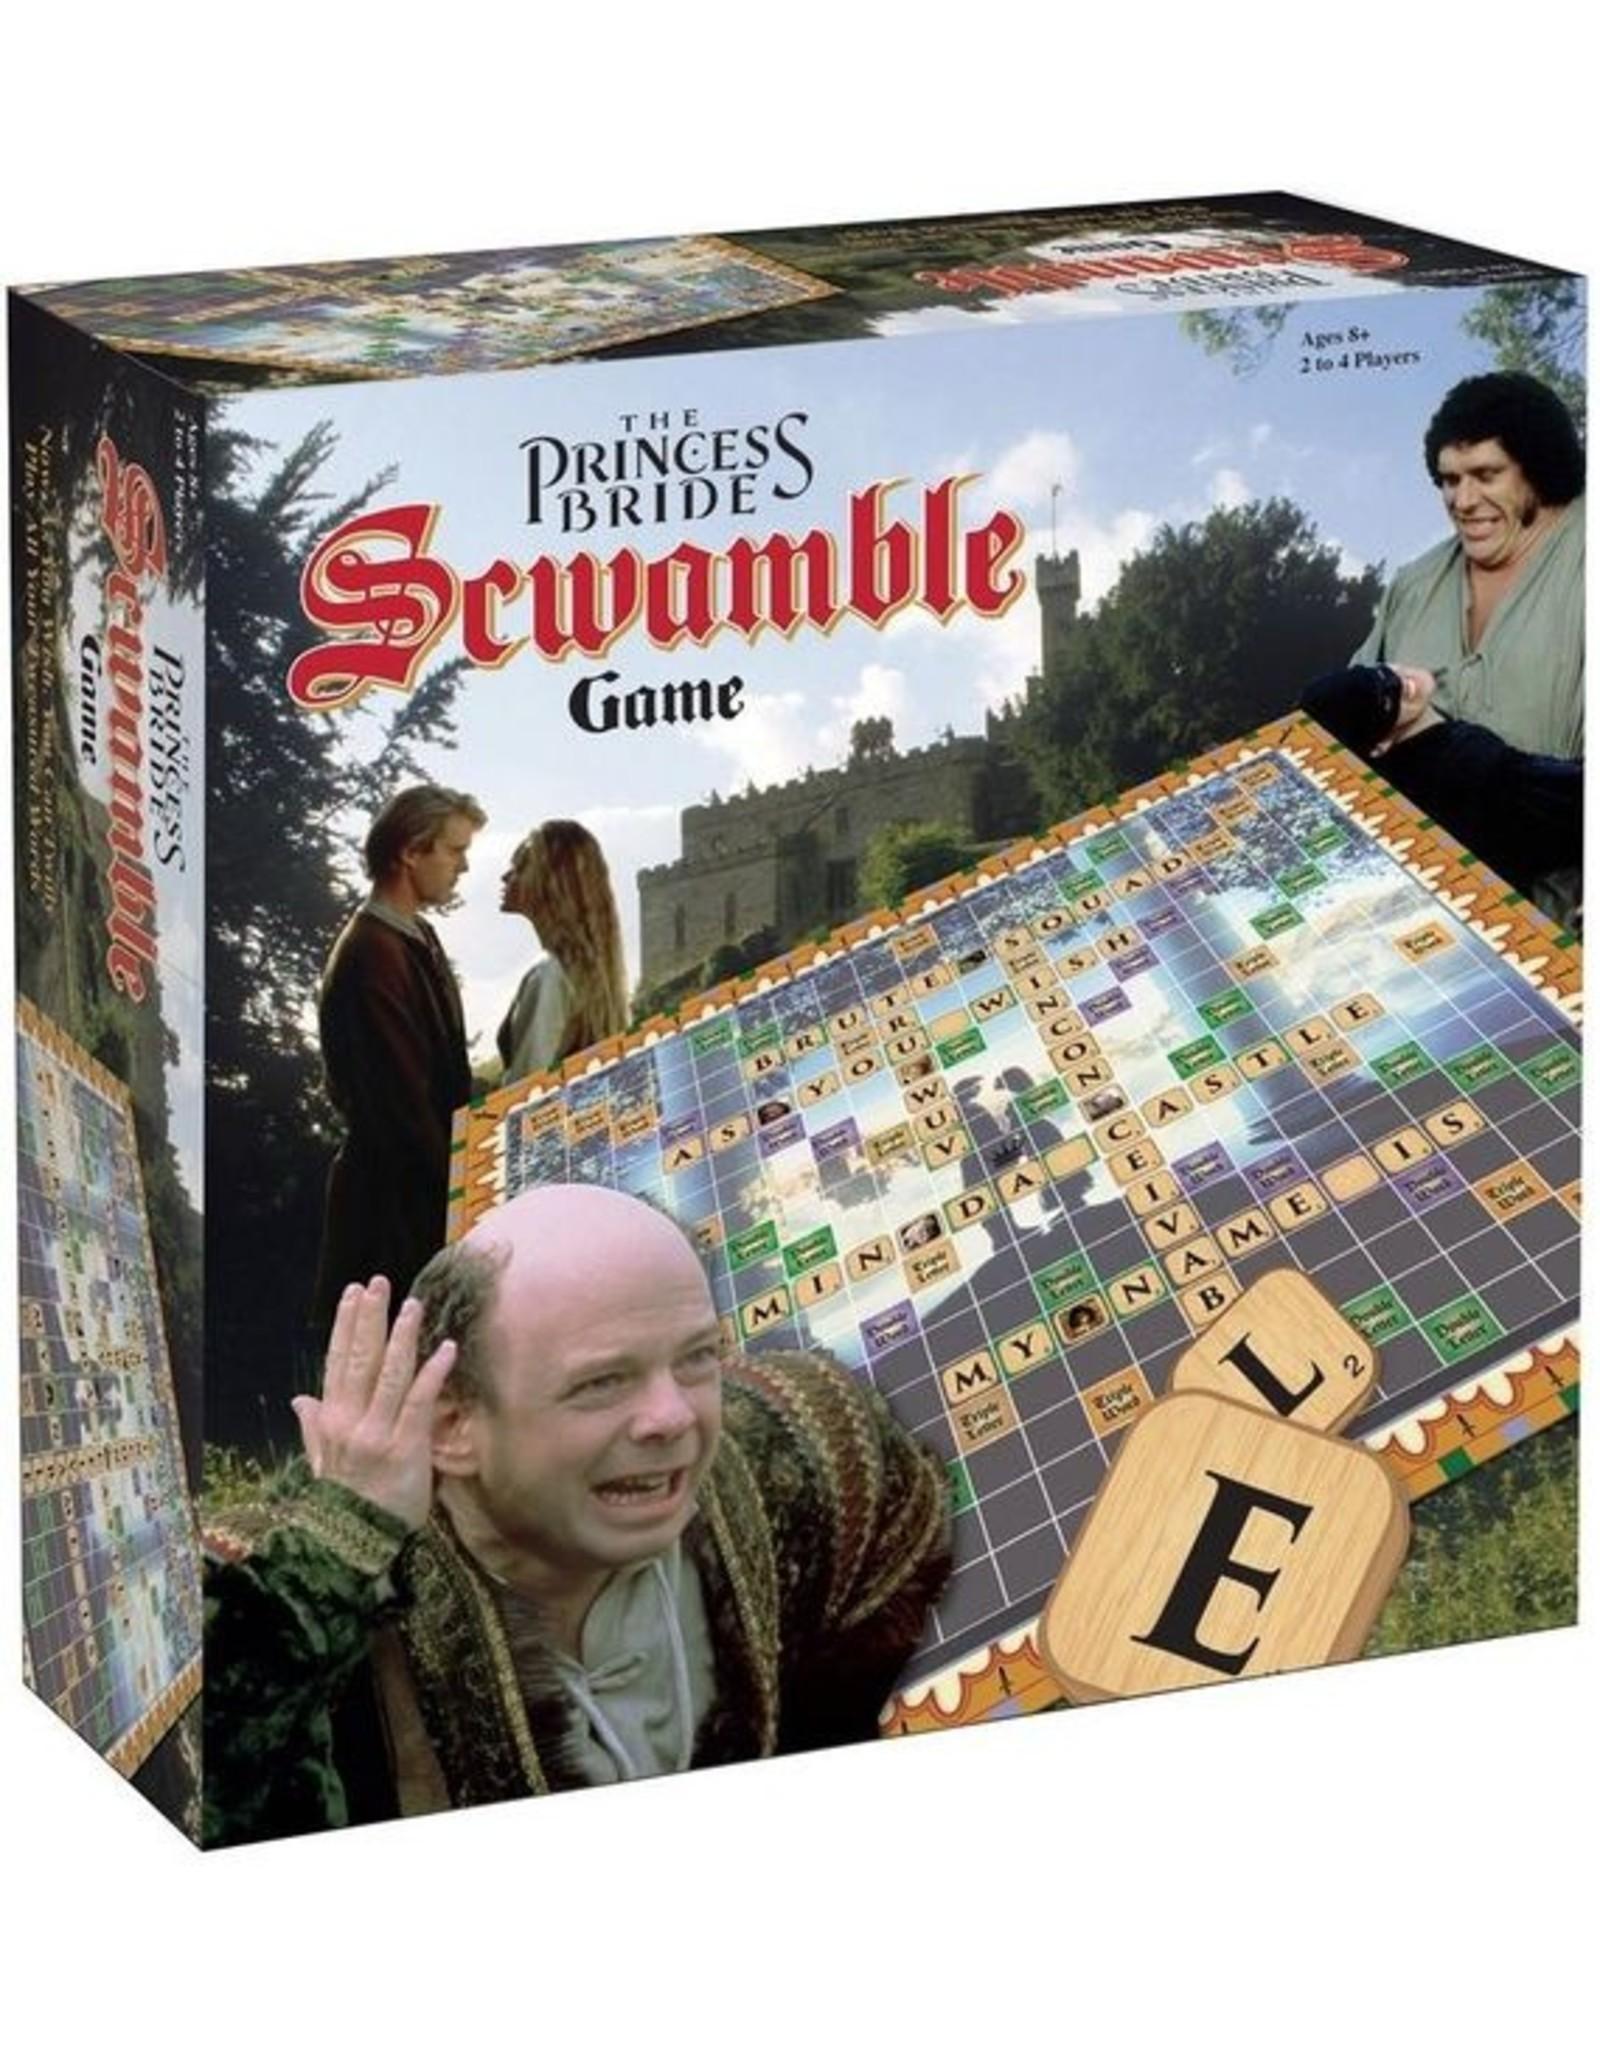 Princess Bride: Scwamble